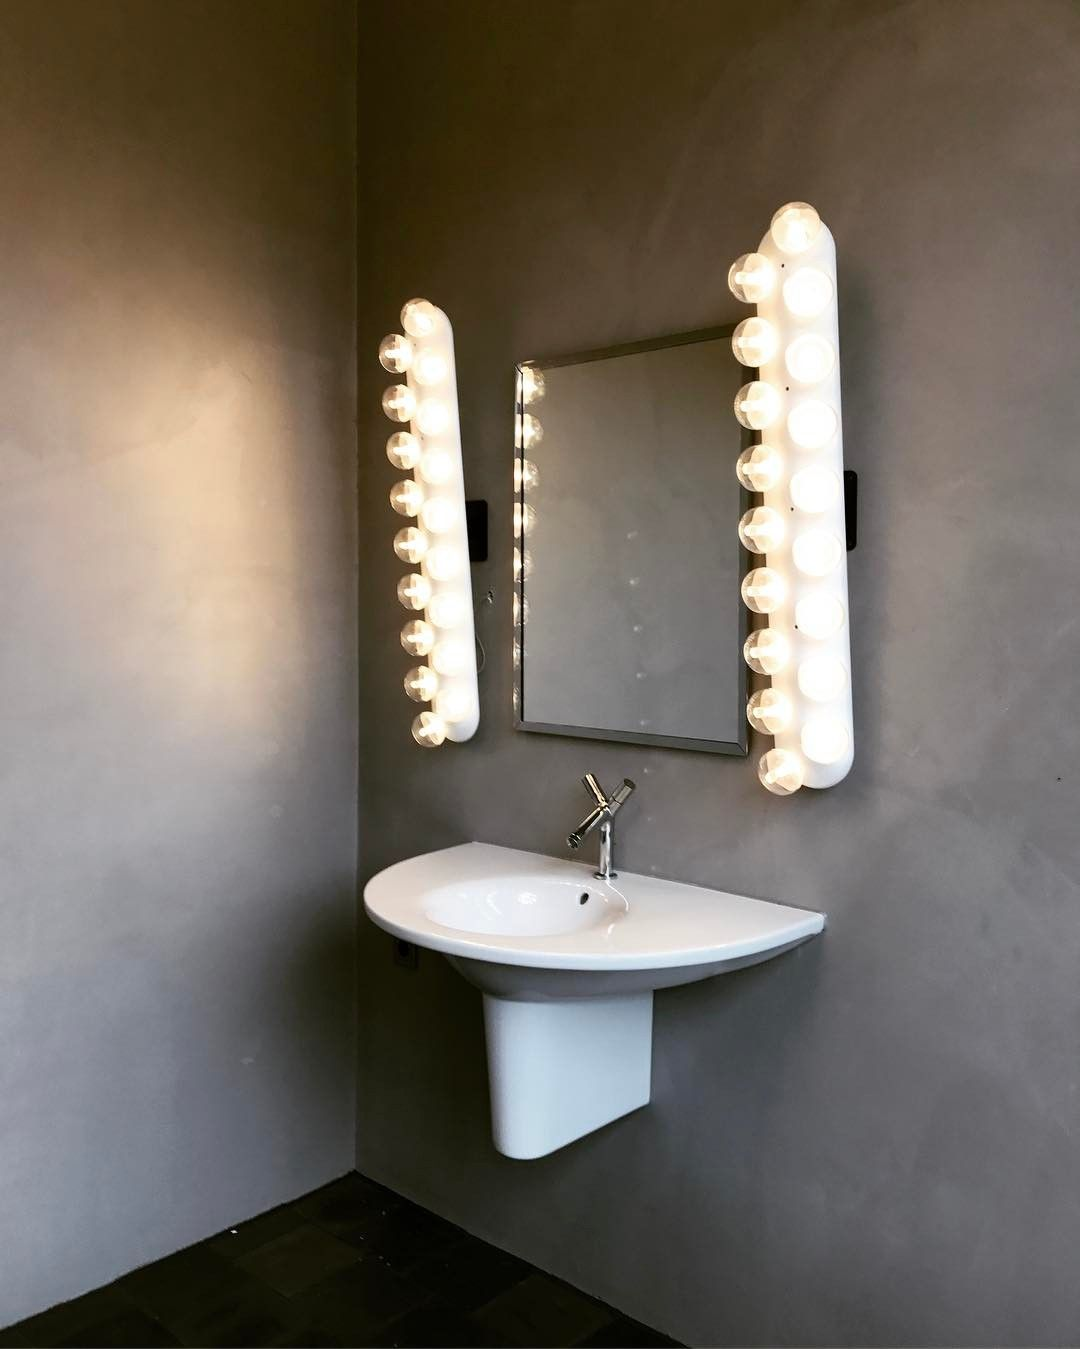 Interior design of bathroom prop light wall by bertjan pot via moooi  ooi  bathroom